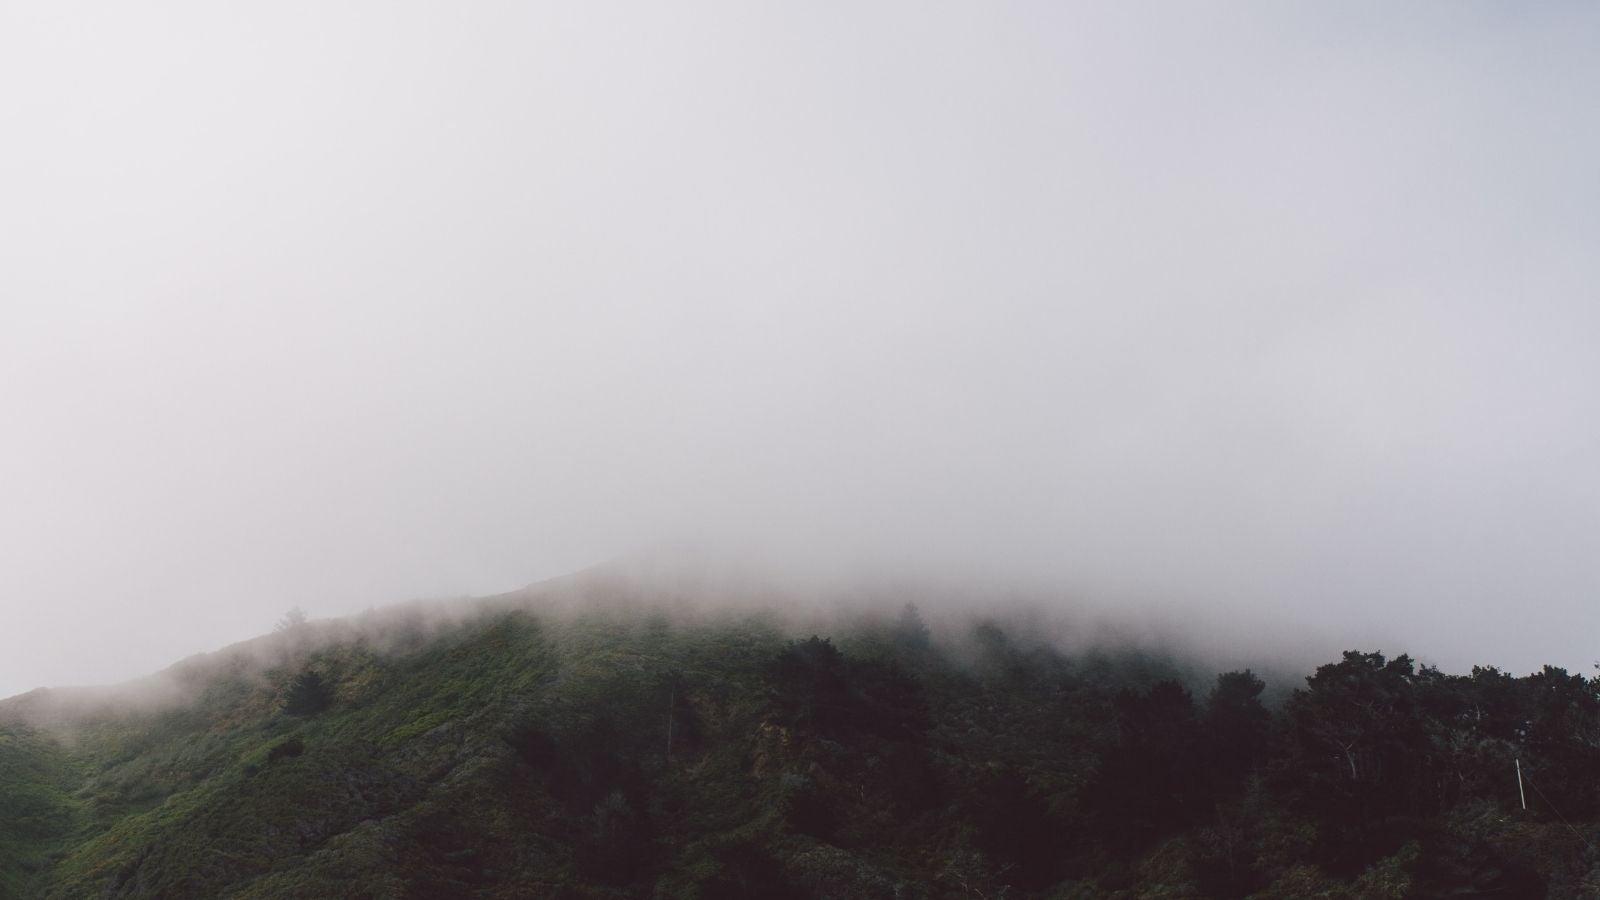 Hill shroud in mist